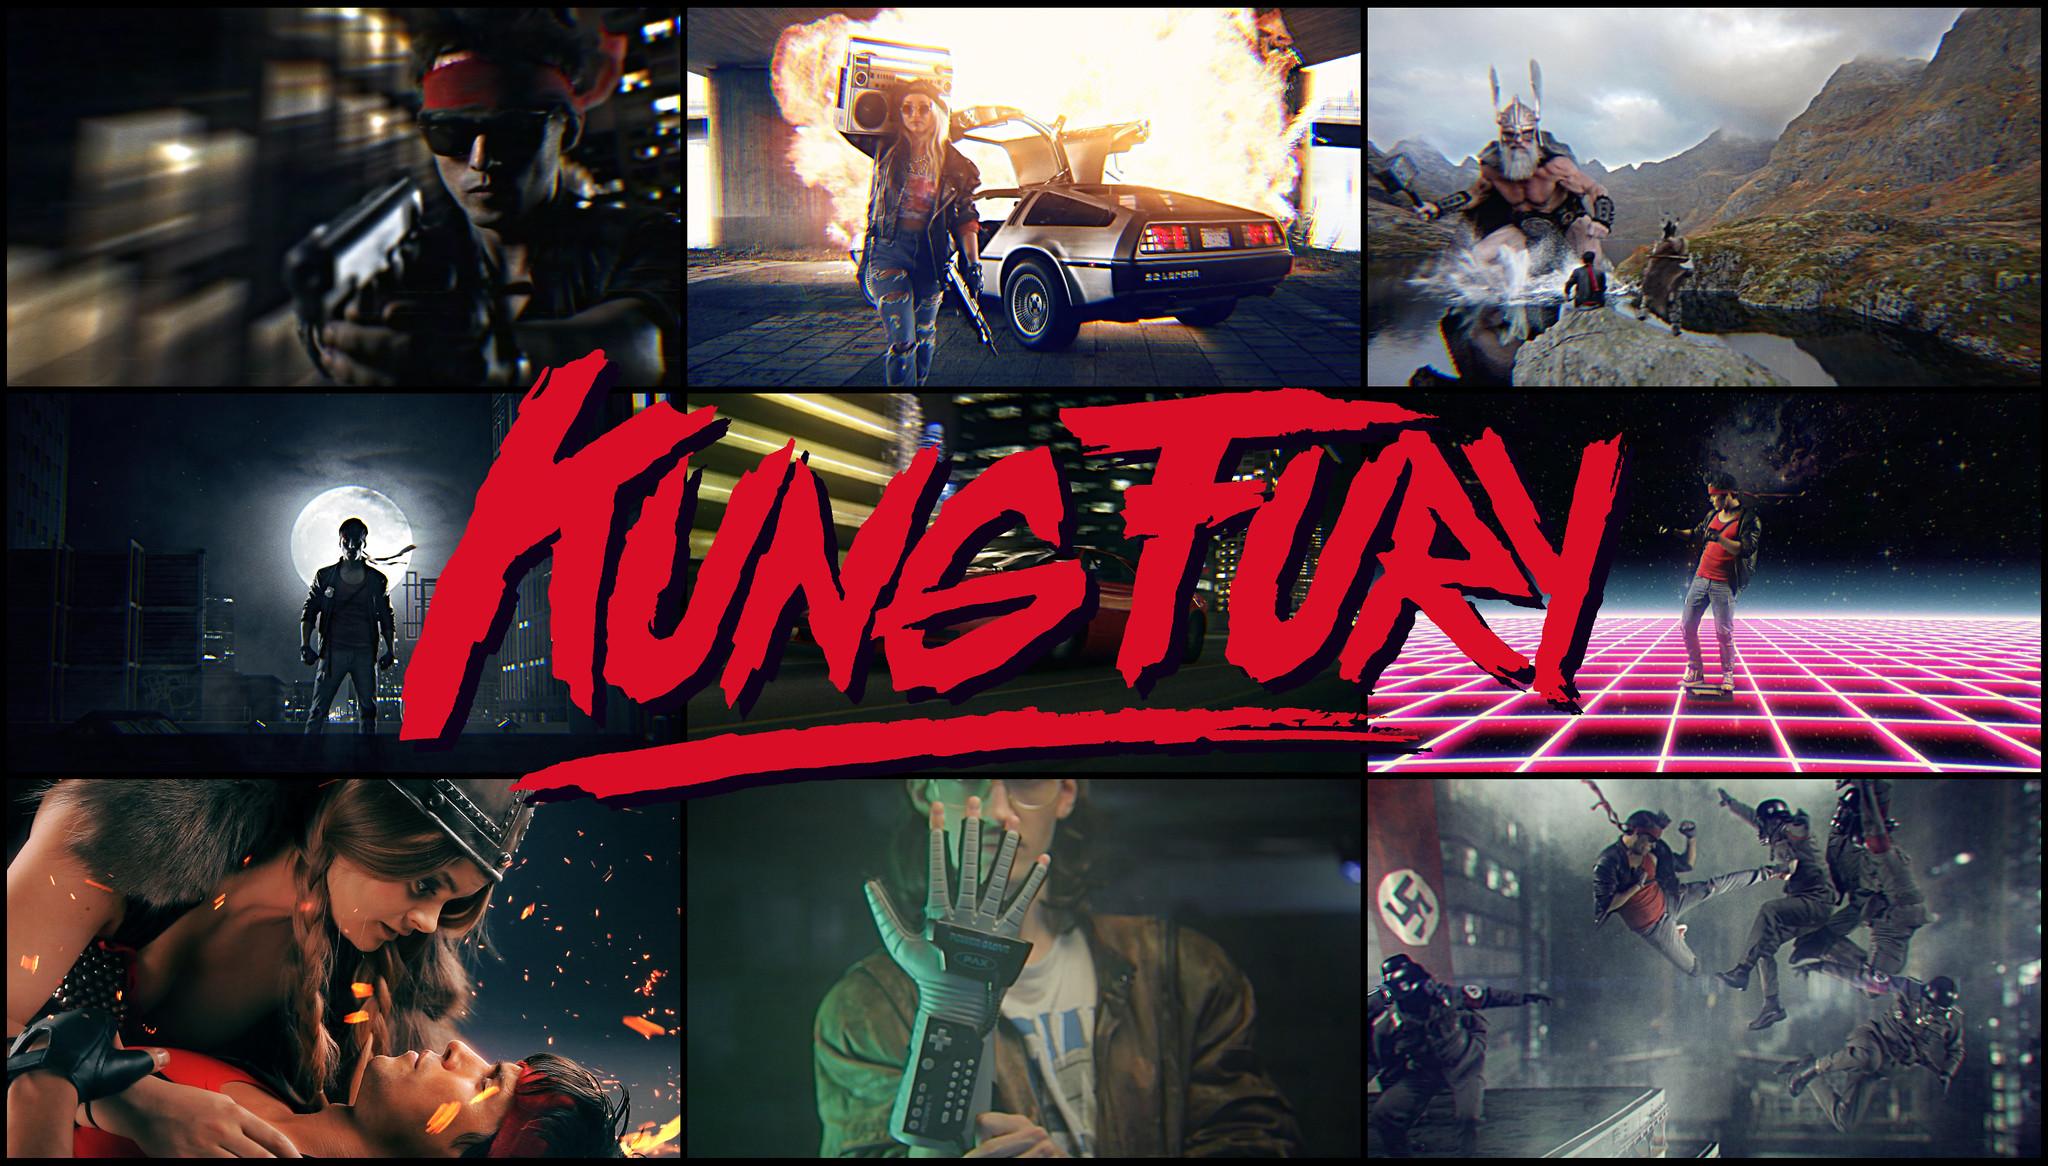 Kung fucking Fury